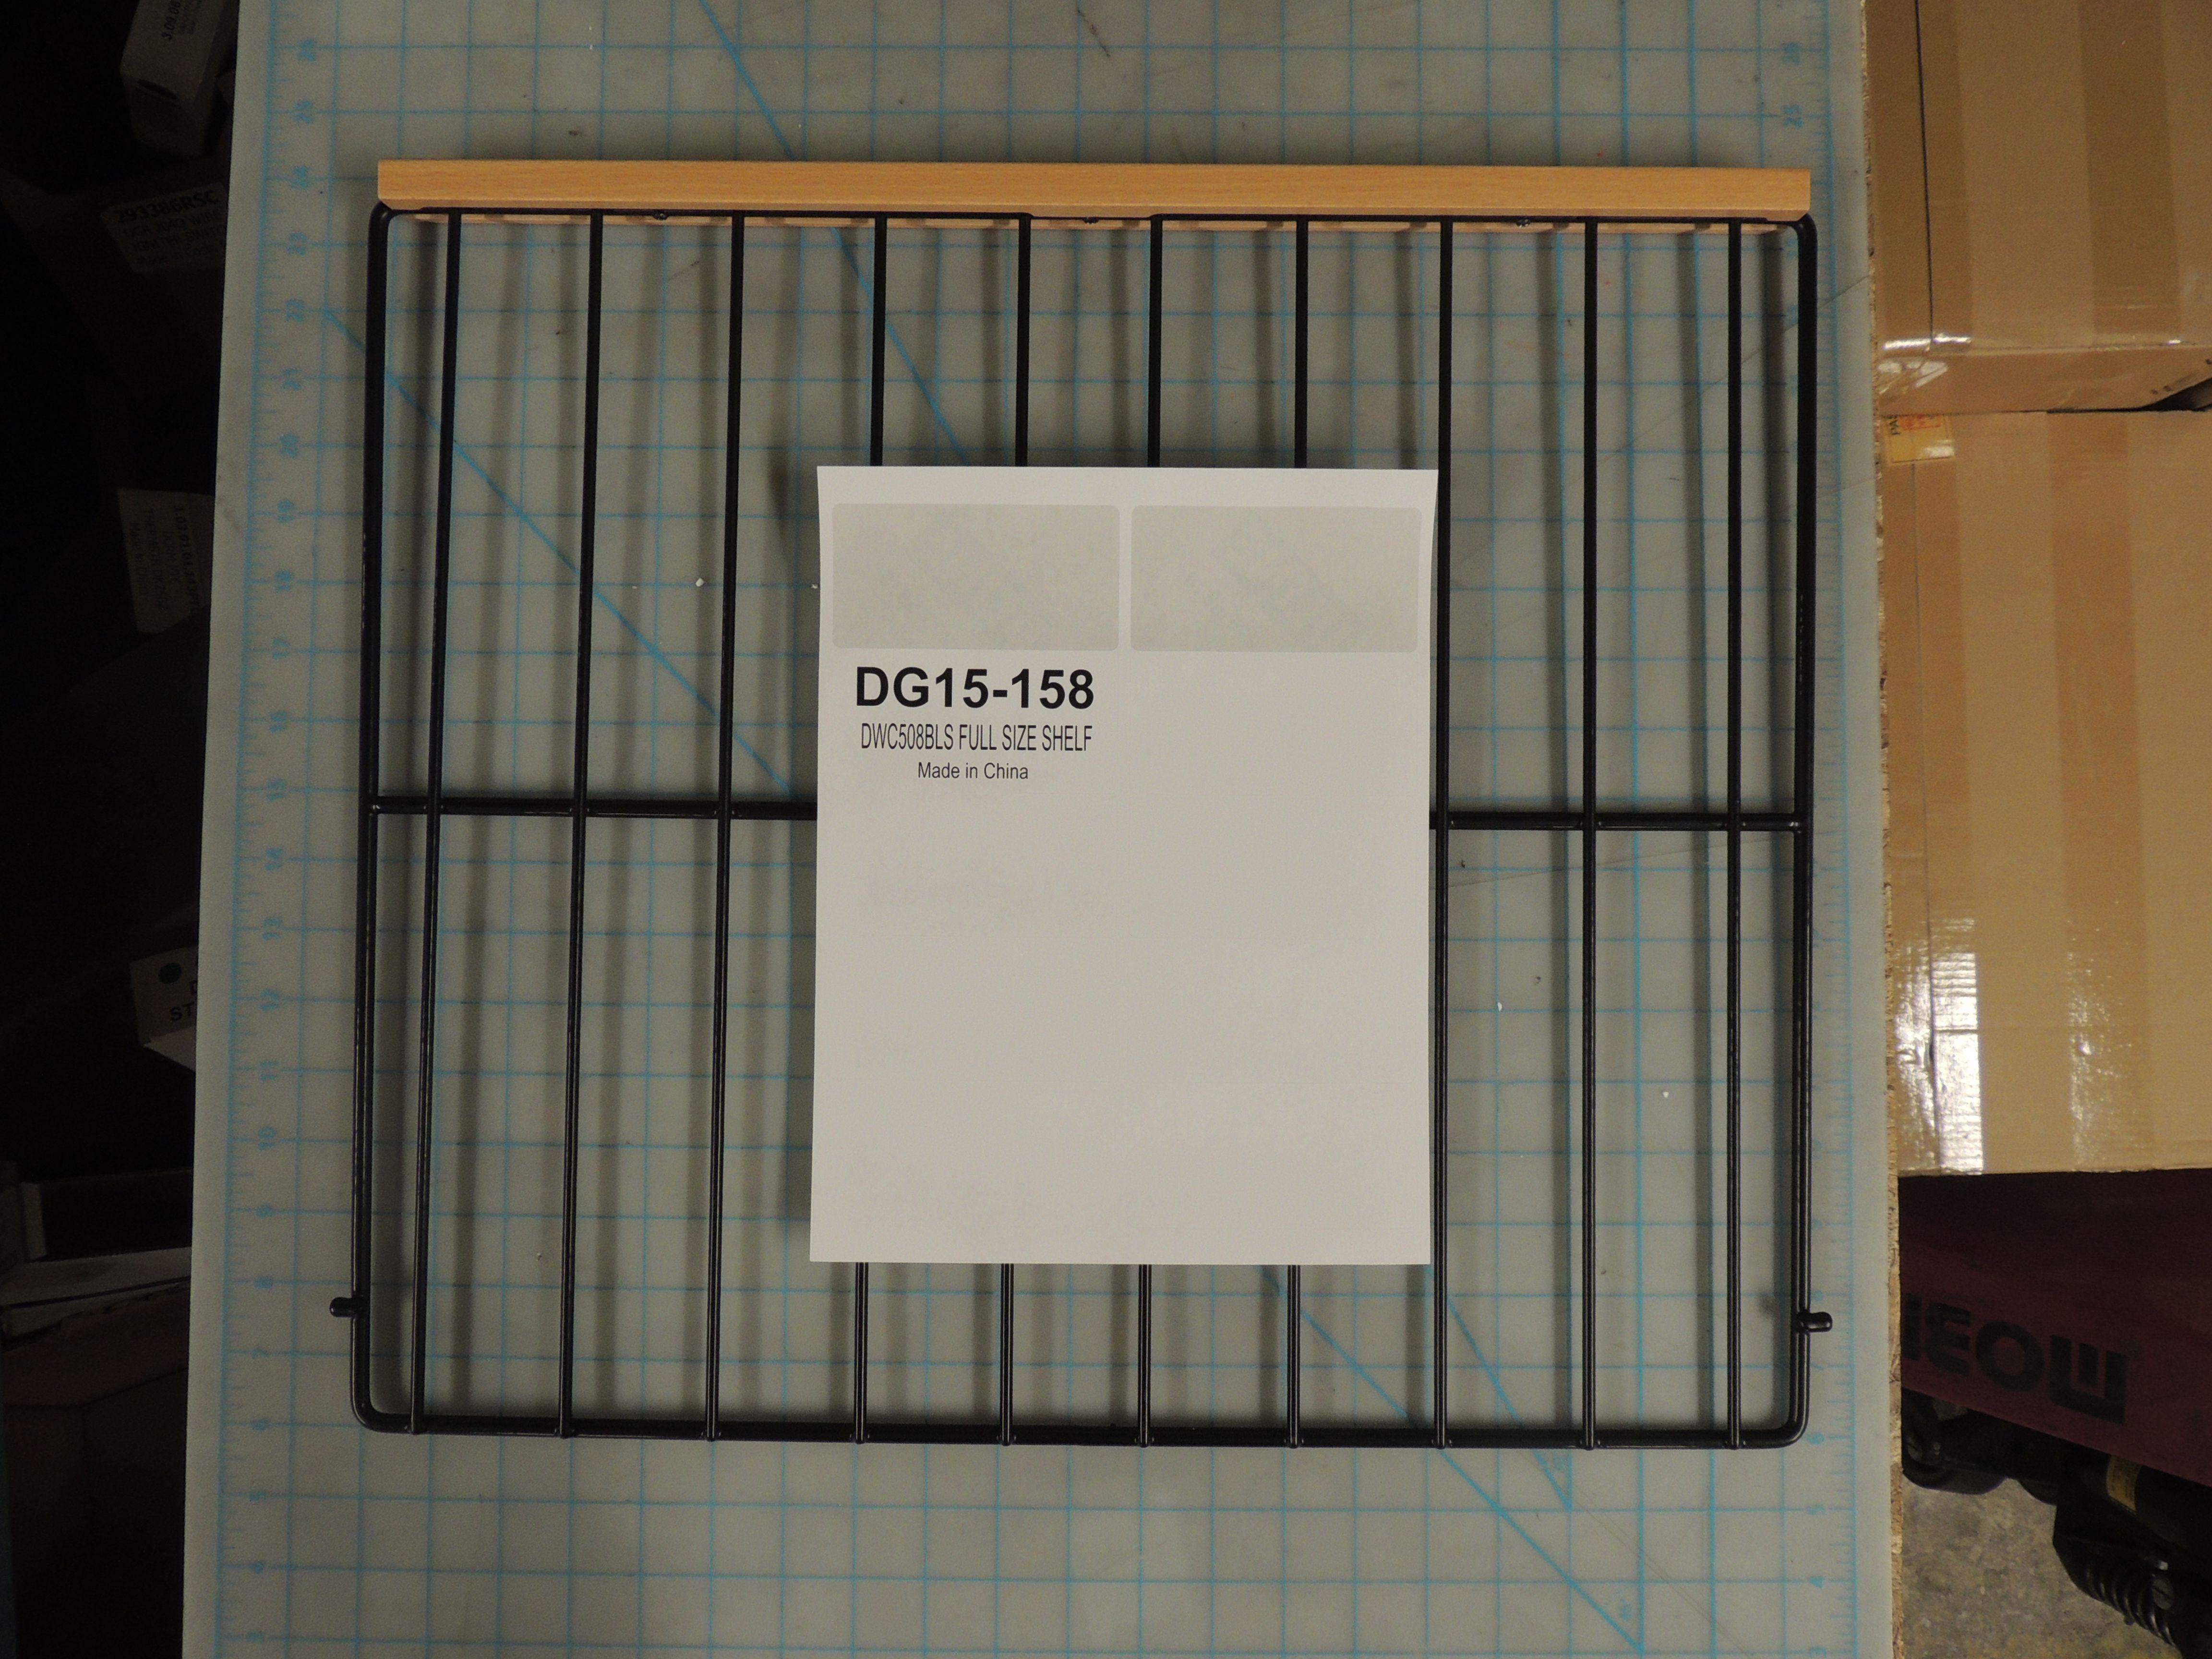 DWC508BLS FULL SIZE SHELF